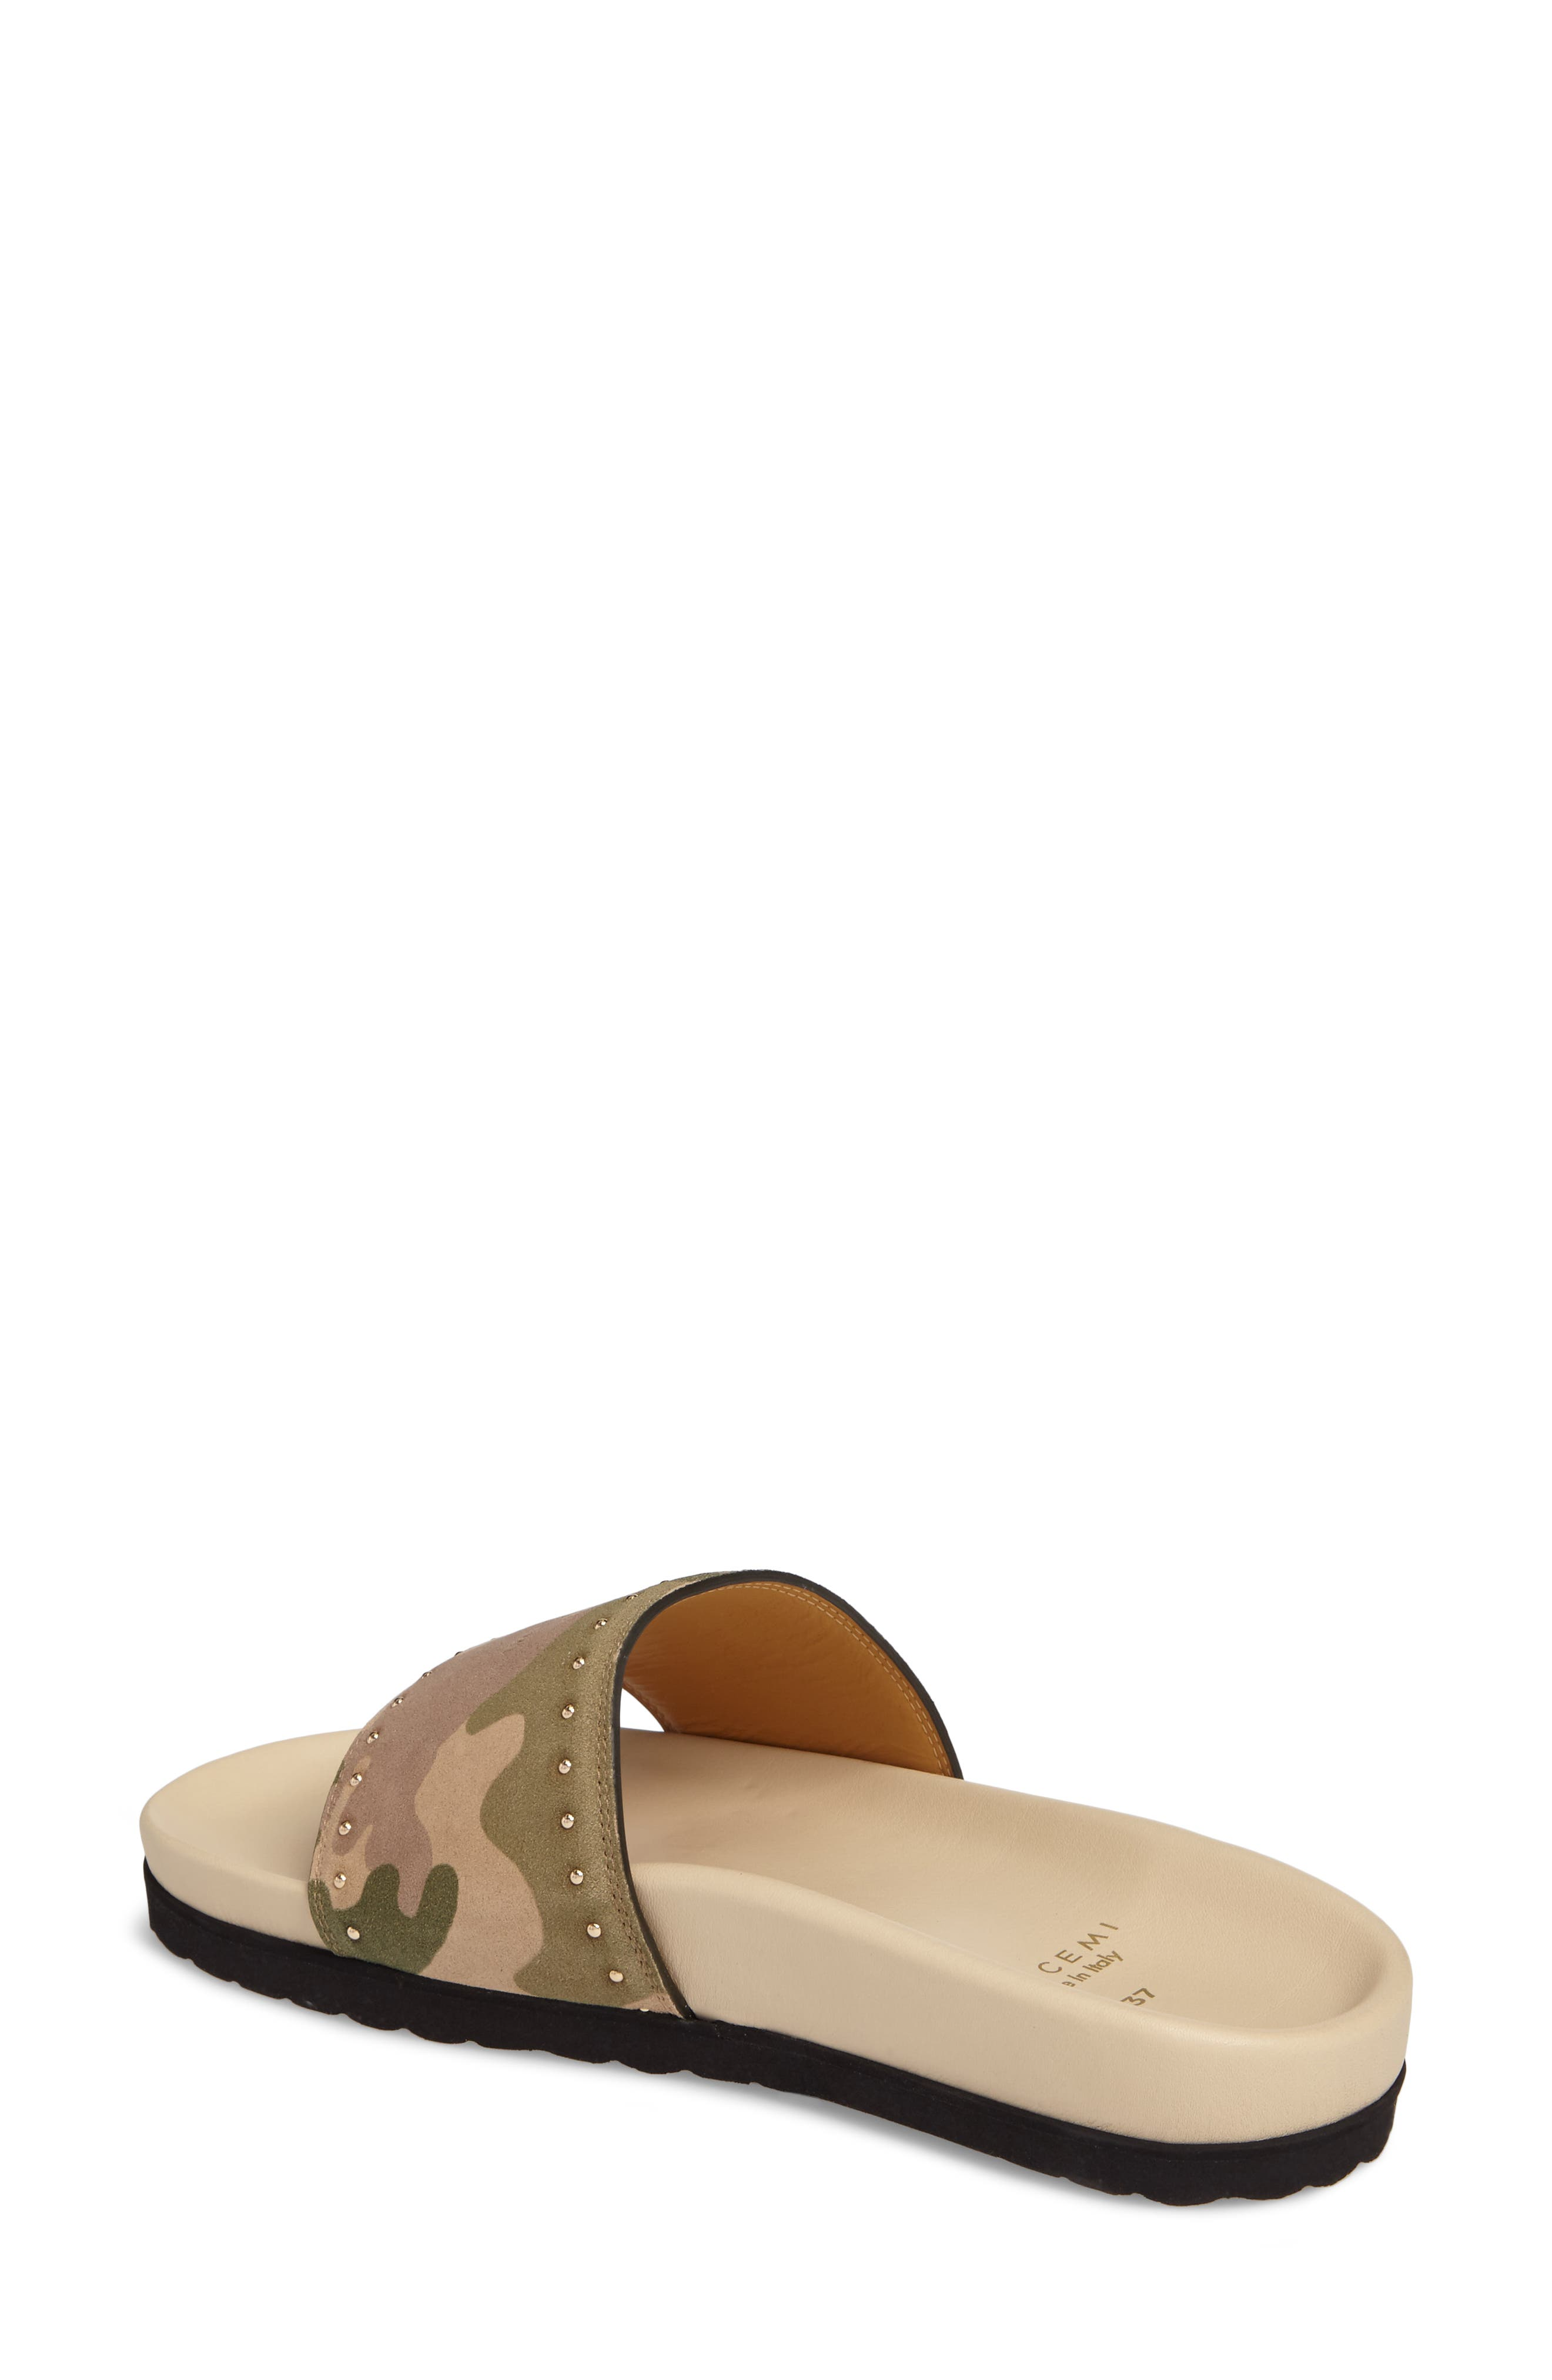 Camo Slide Sandal,                             Alternate thumbnail 2, color,                             Camou